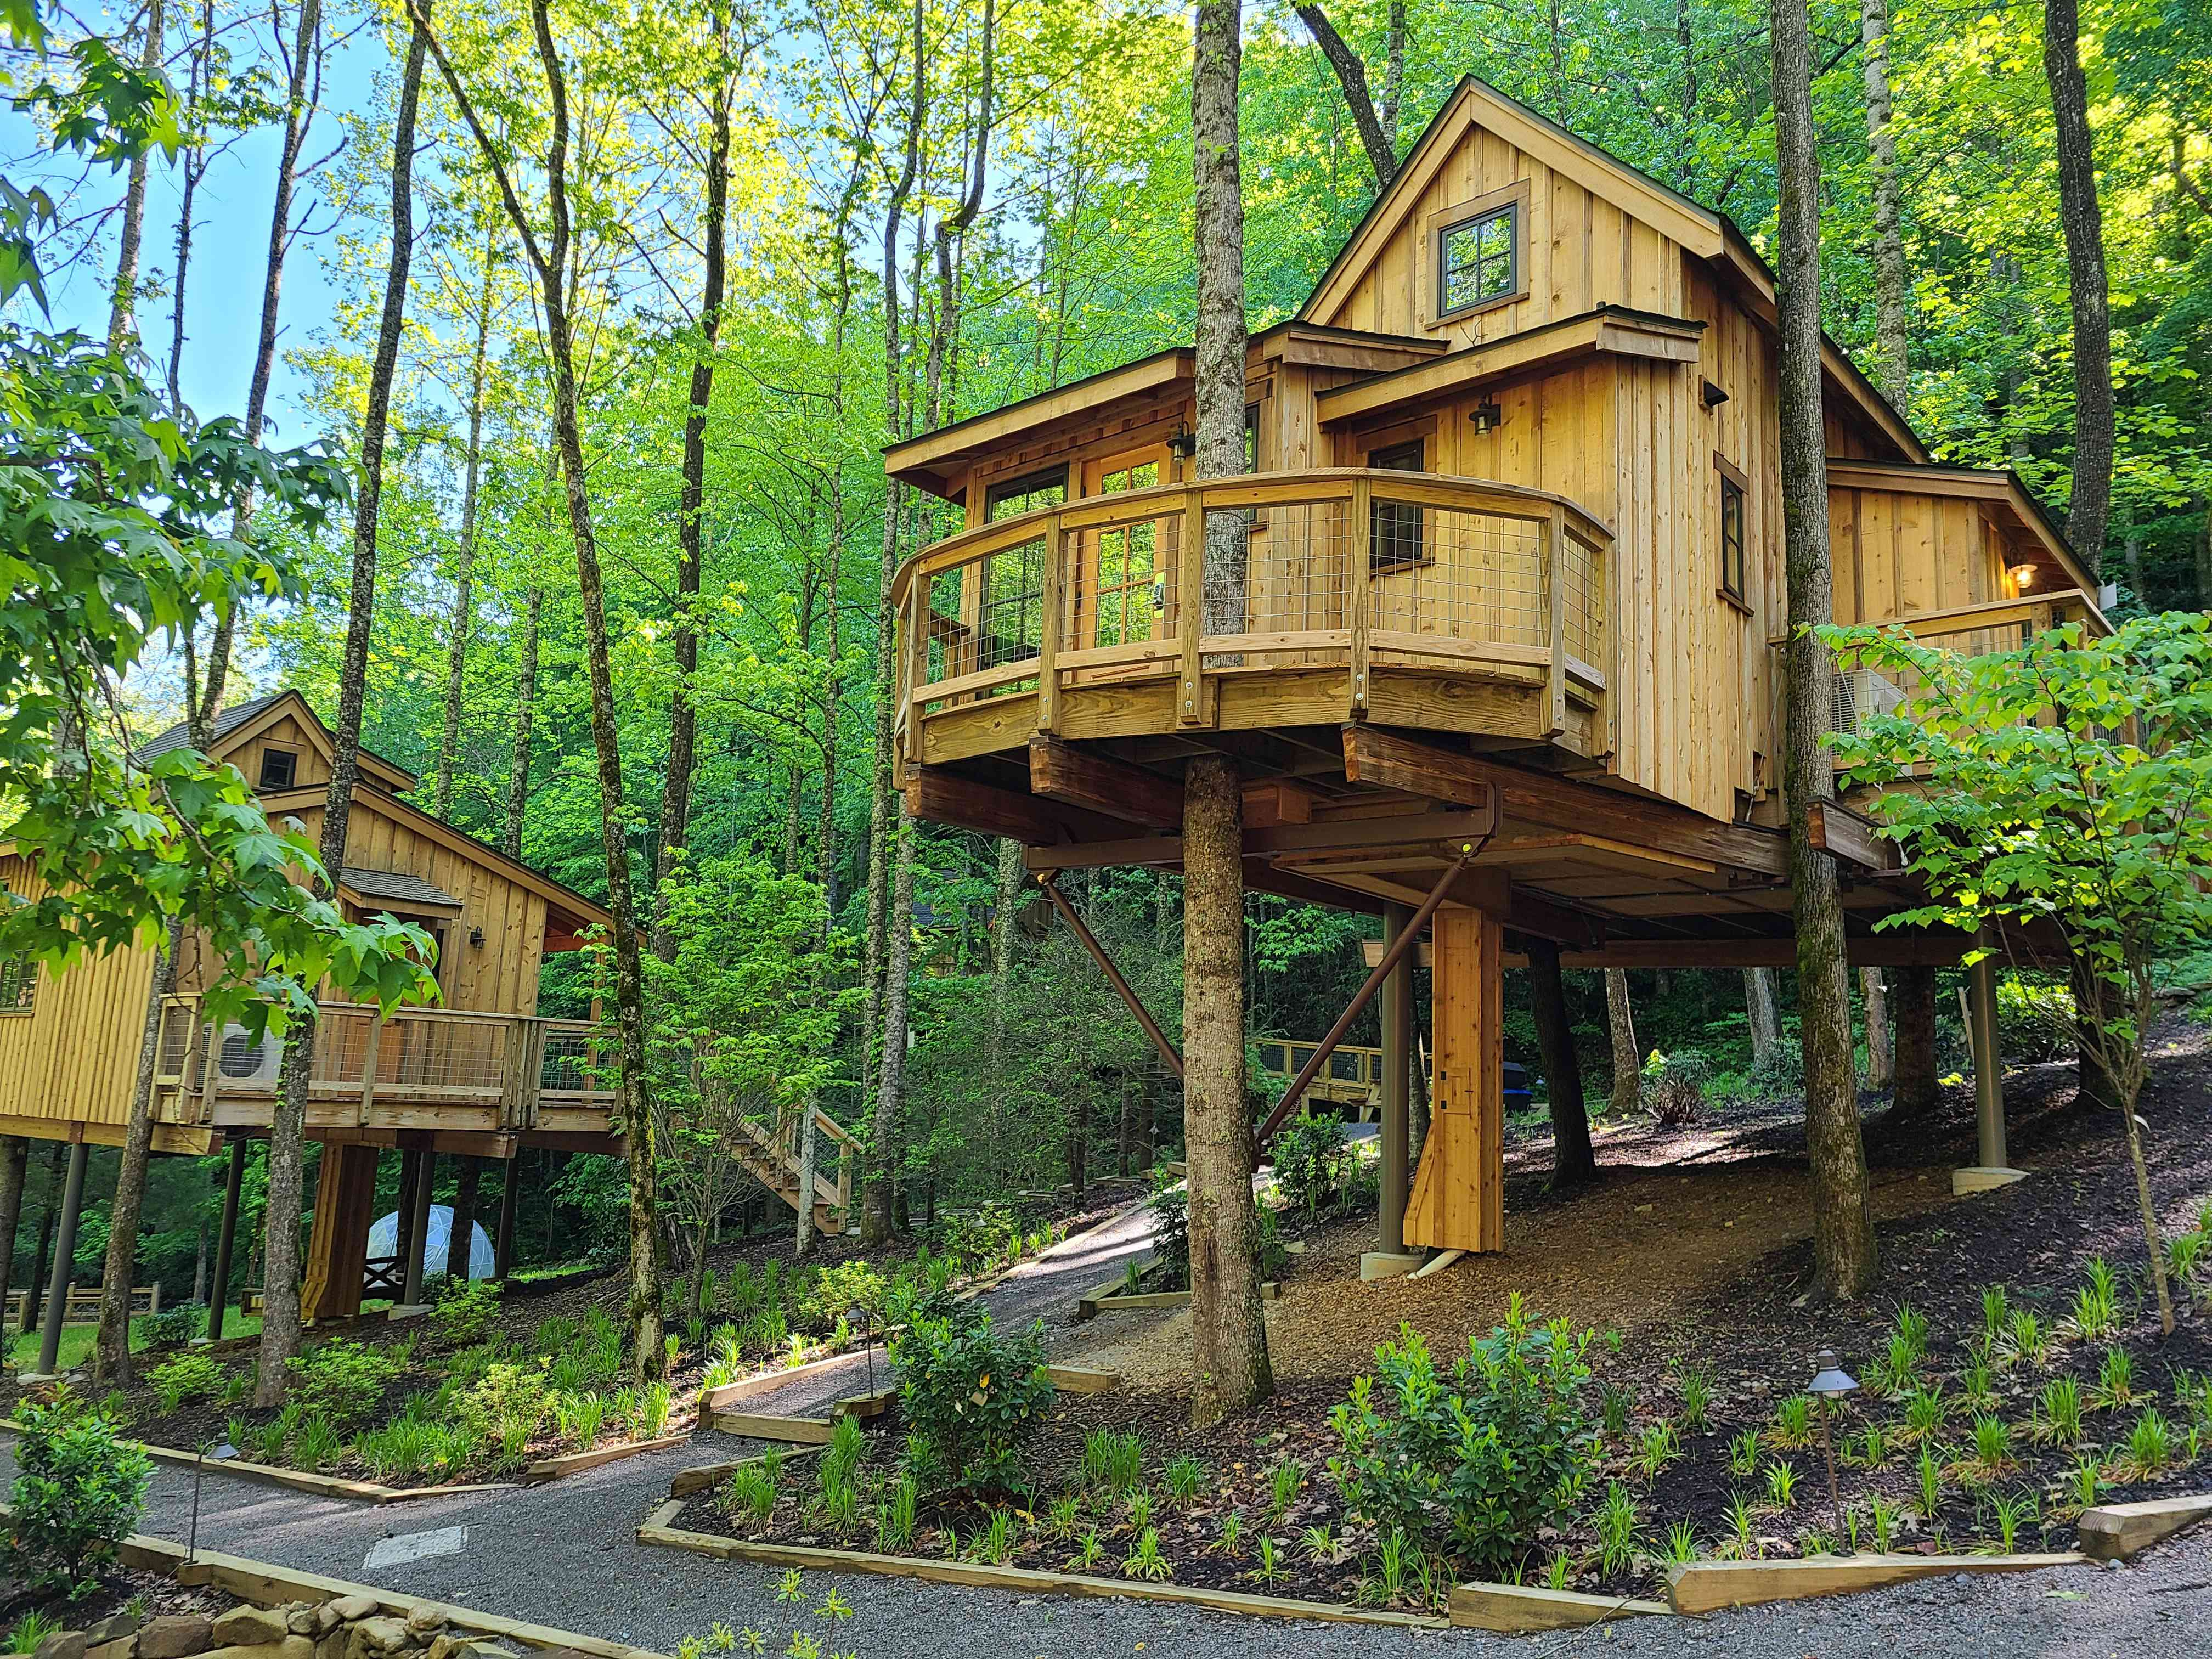 Treehouse accommodation at Treehouse Grove near Gatlinburg